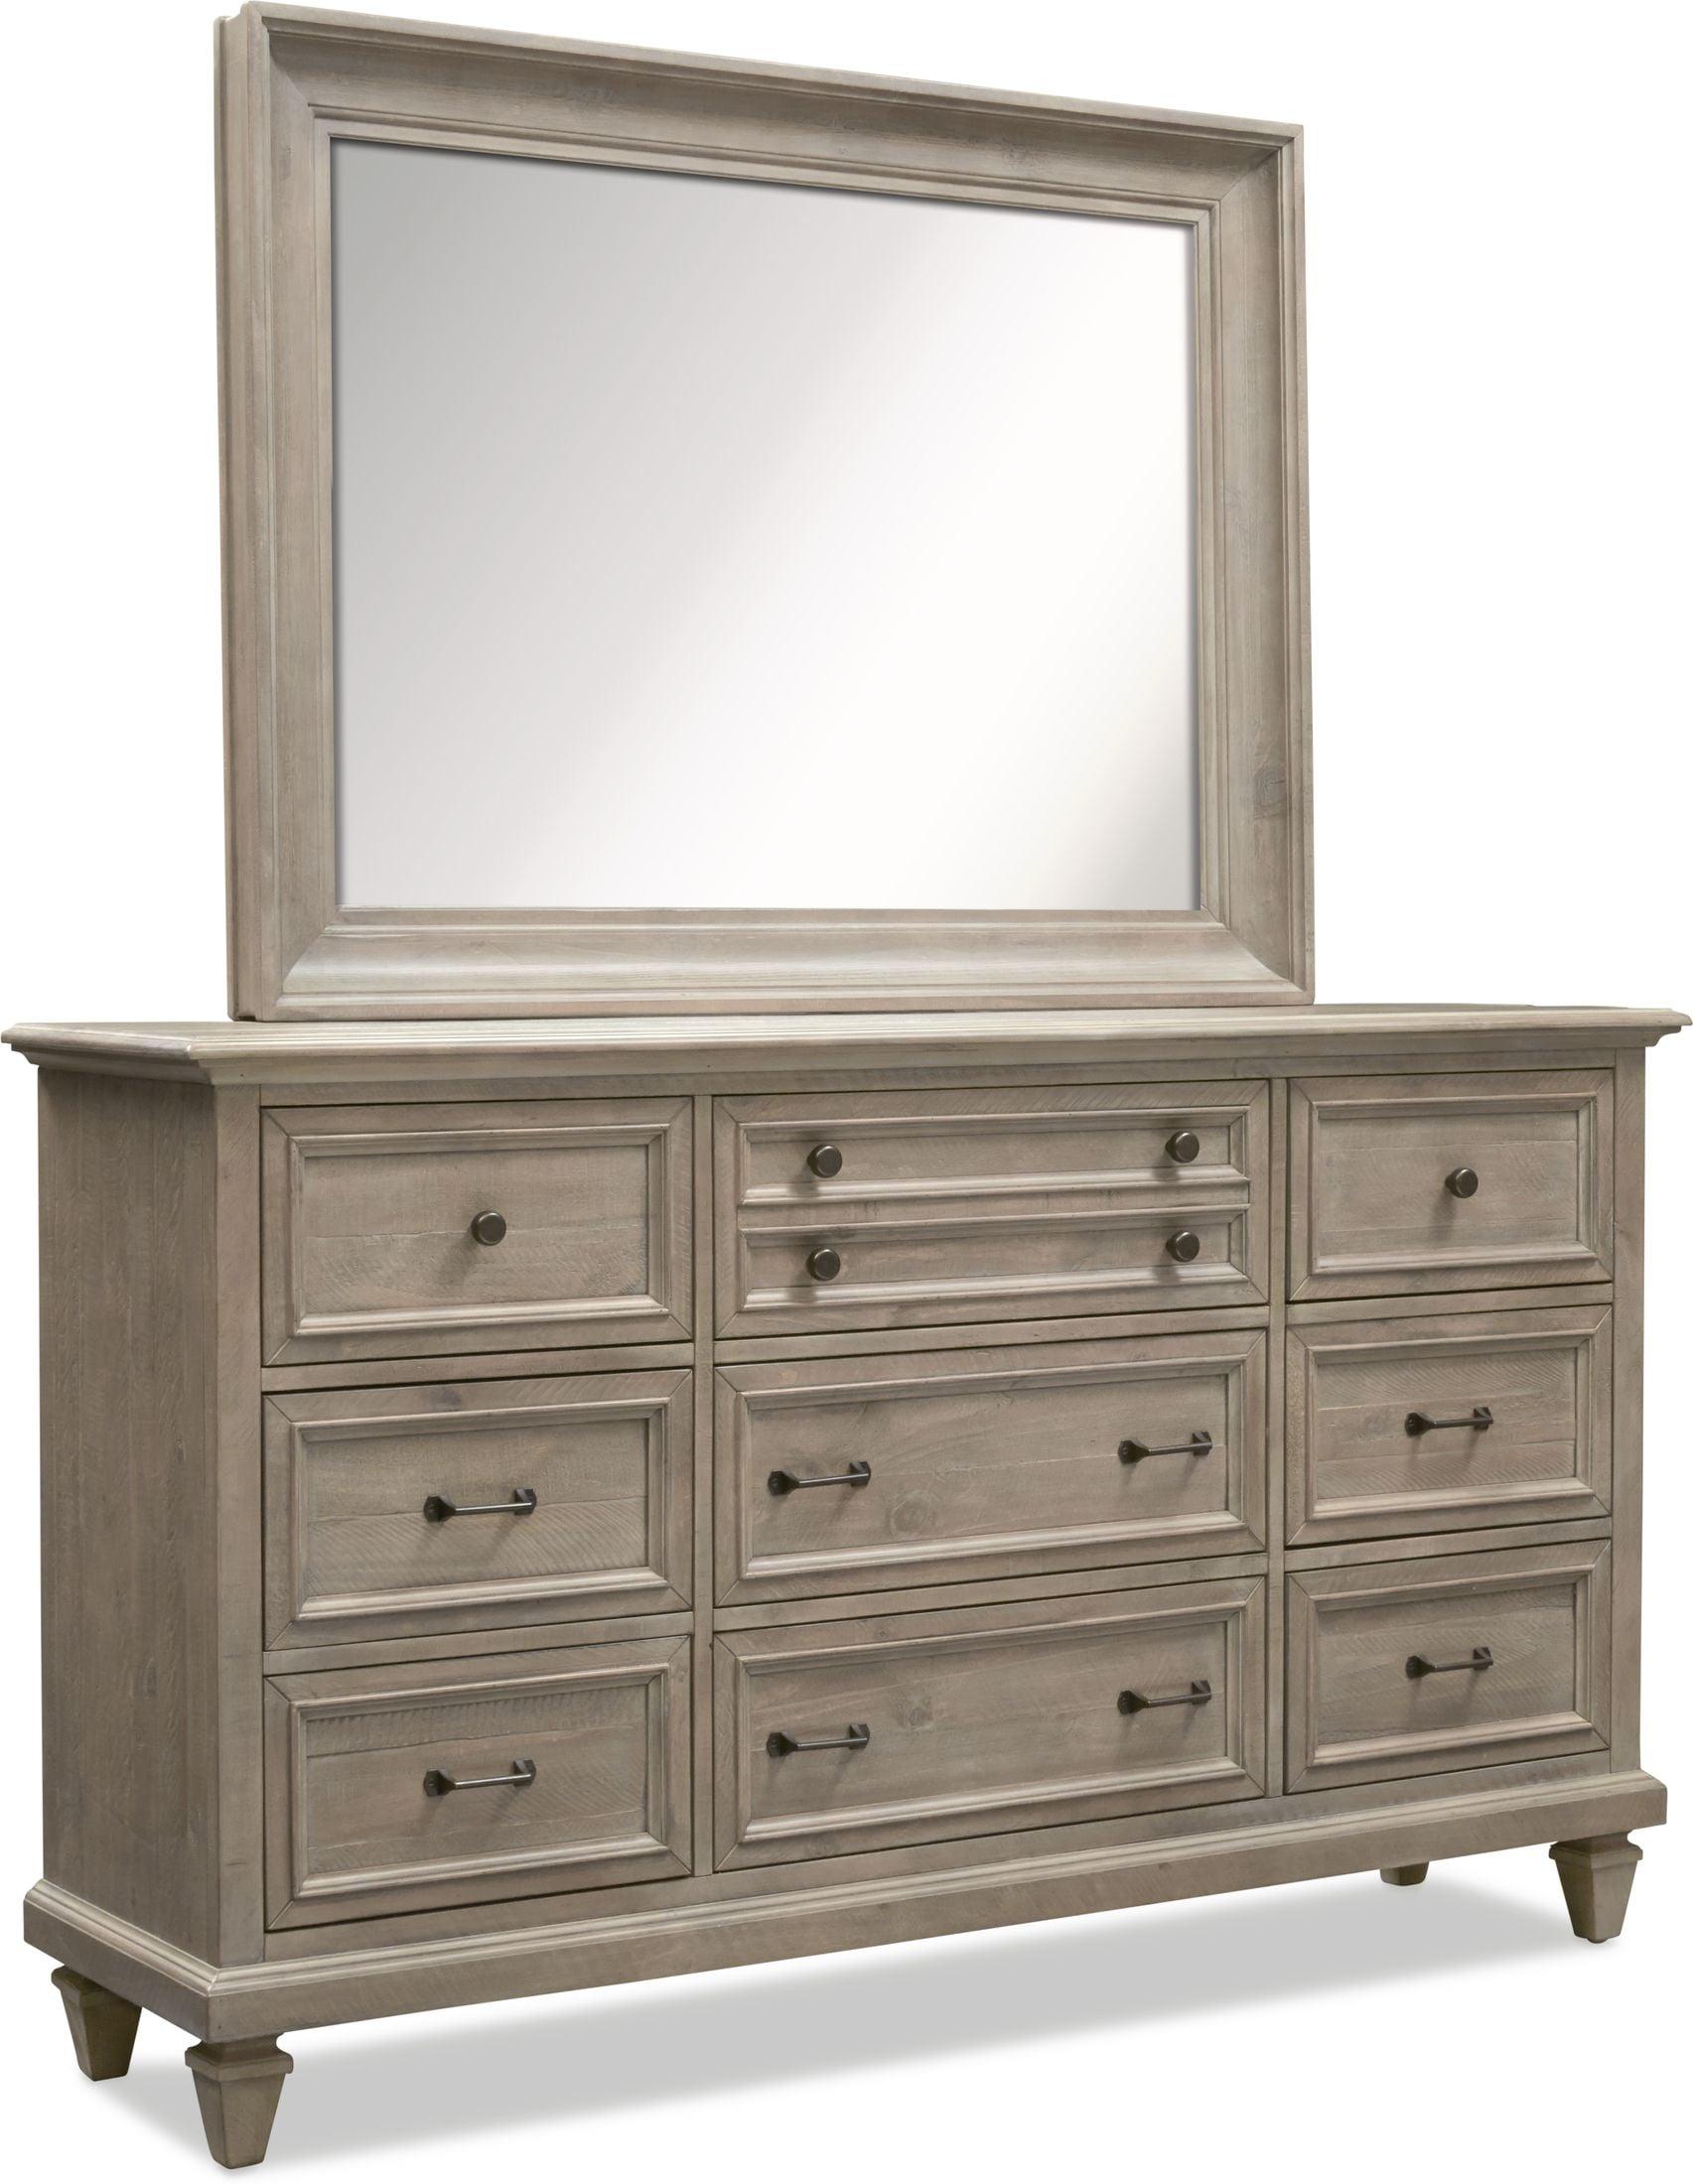 Bedroom Furniture - Harrison Dresser and Mirror - Gray